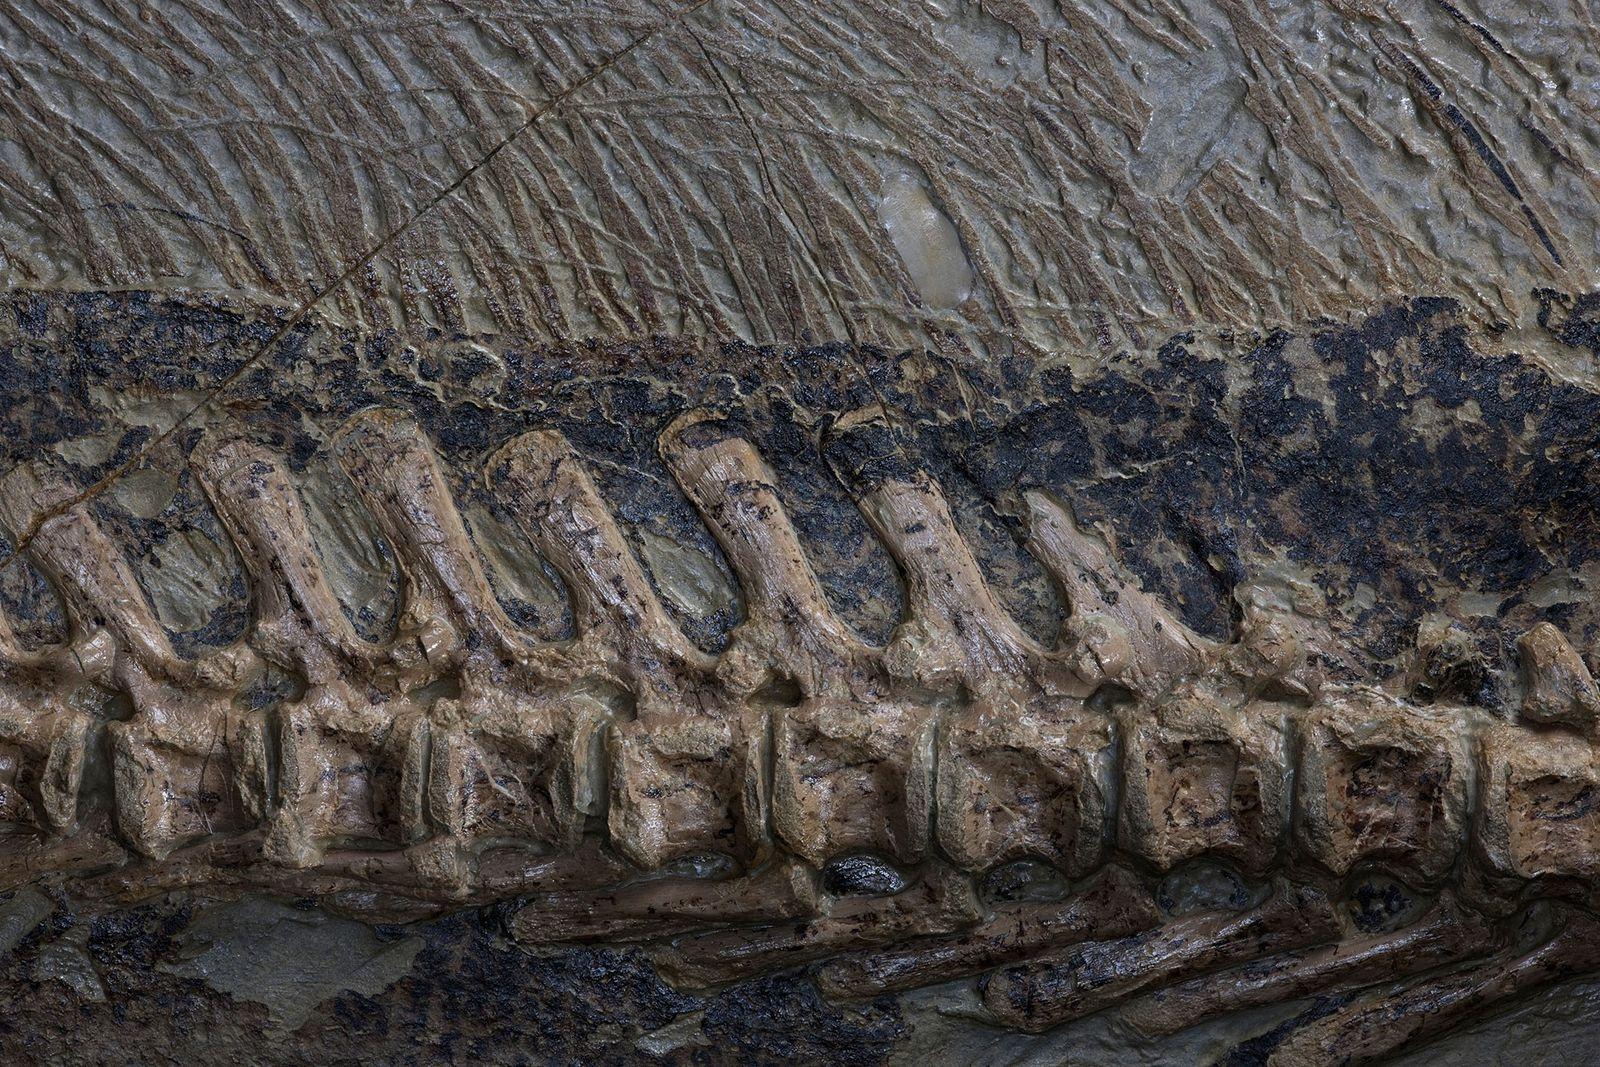 Fossils of oddball crocodile relative found in Texas suburb